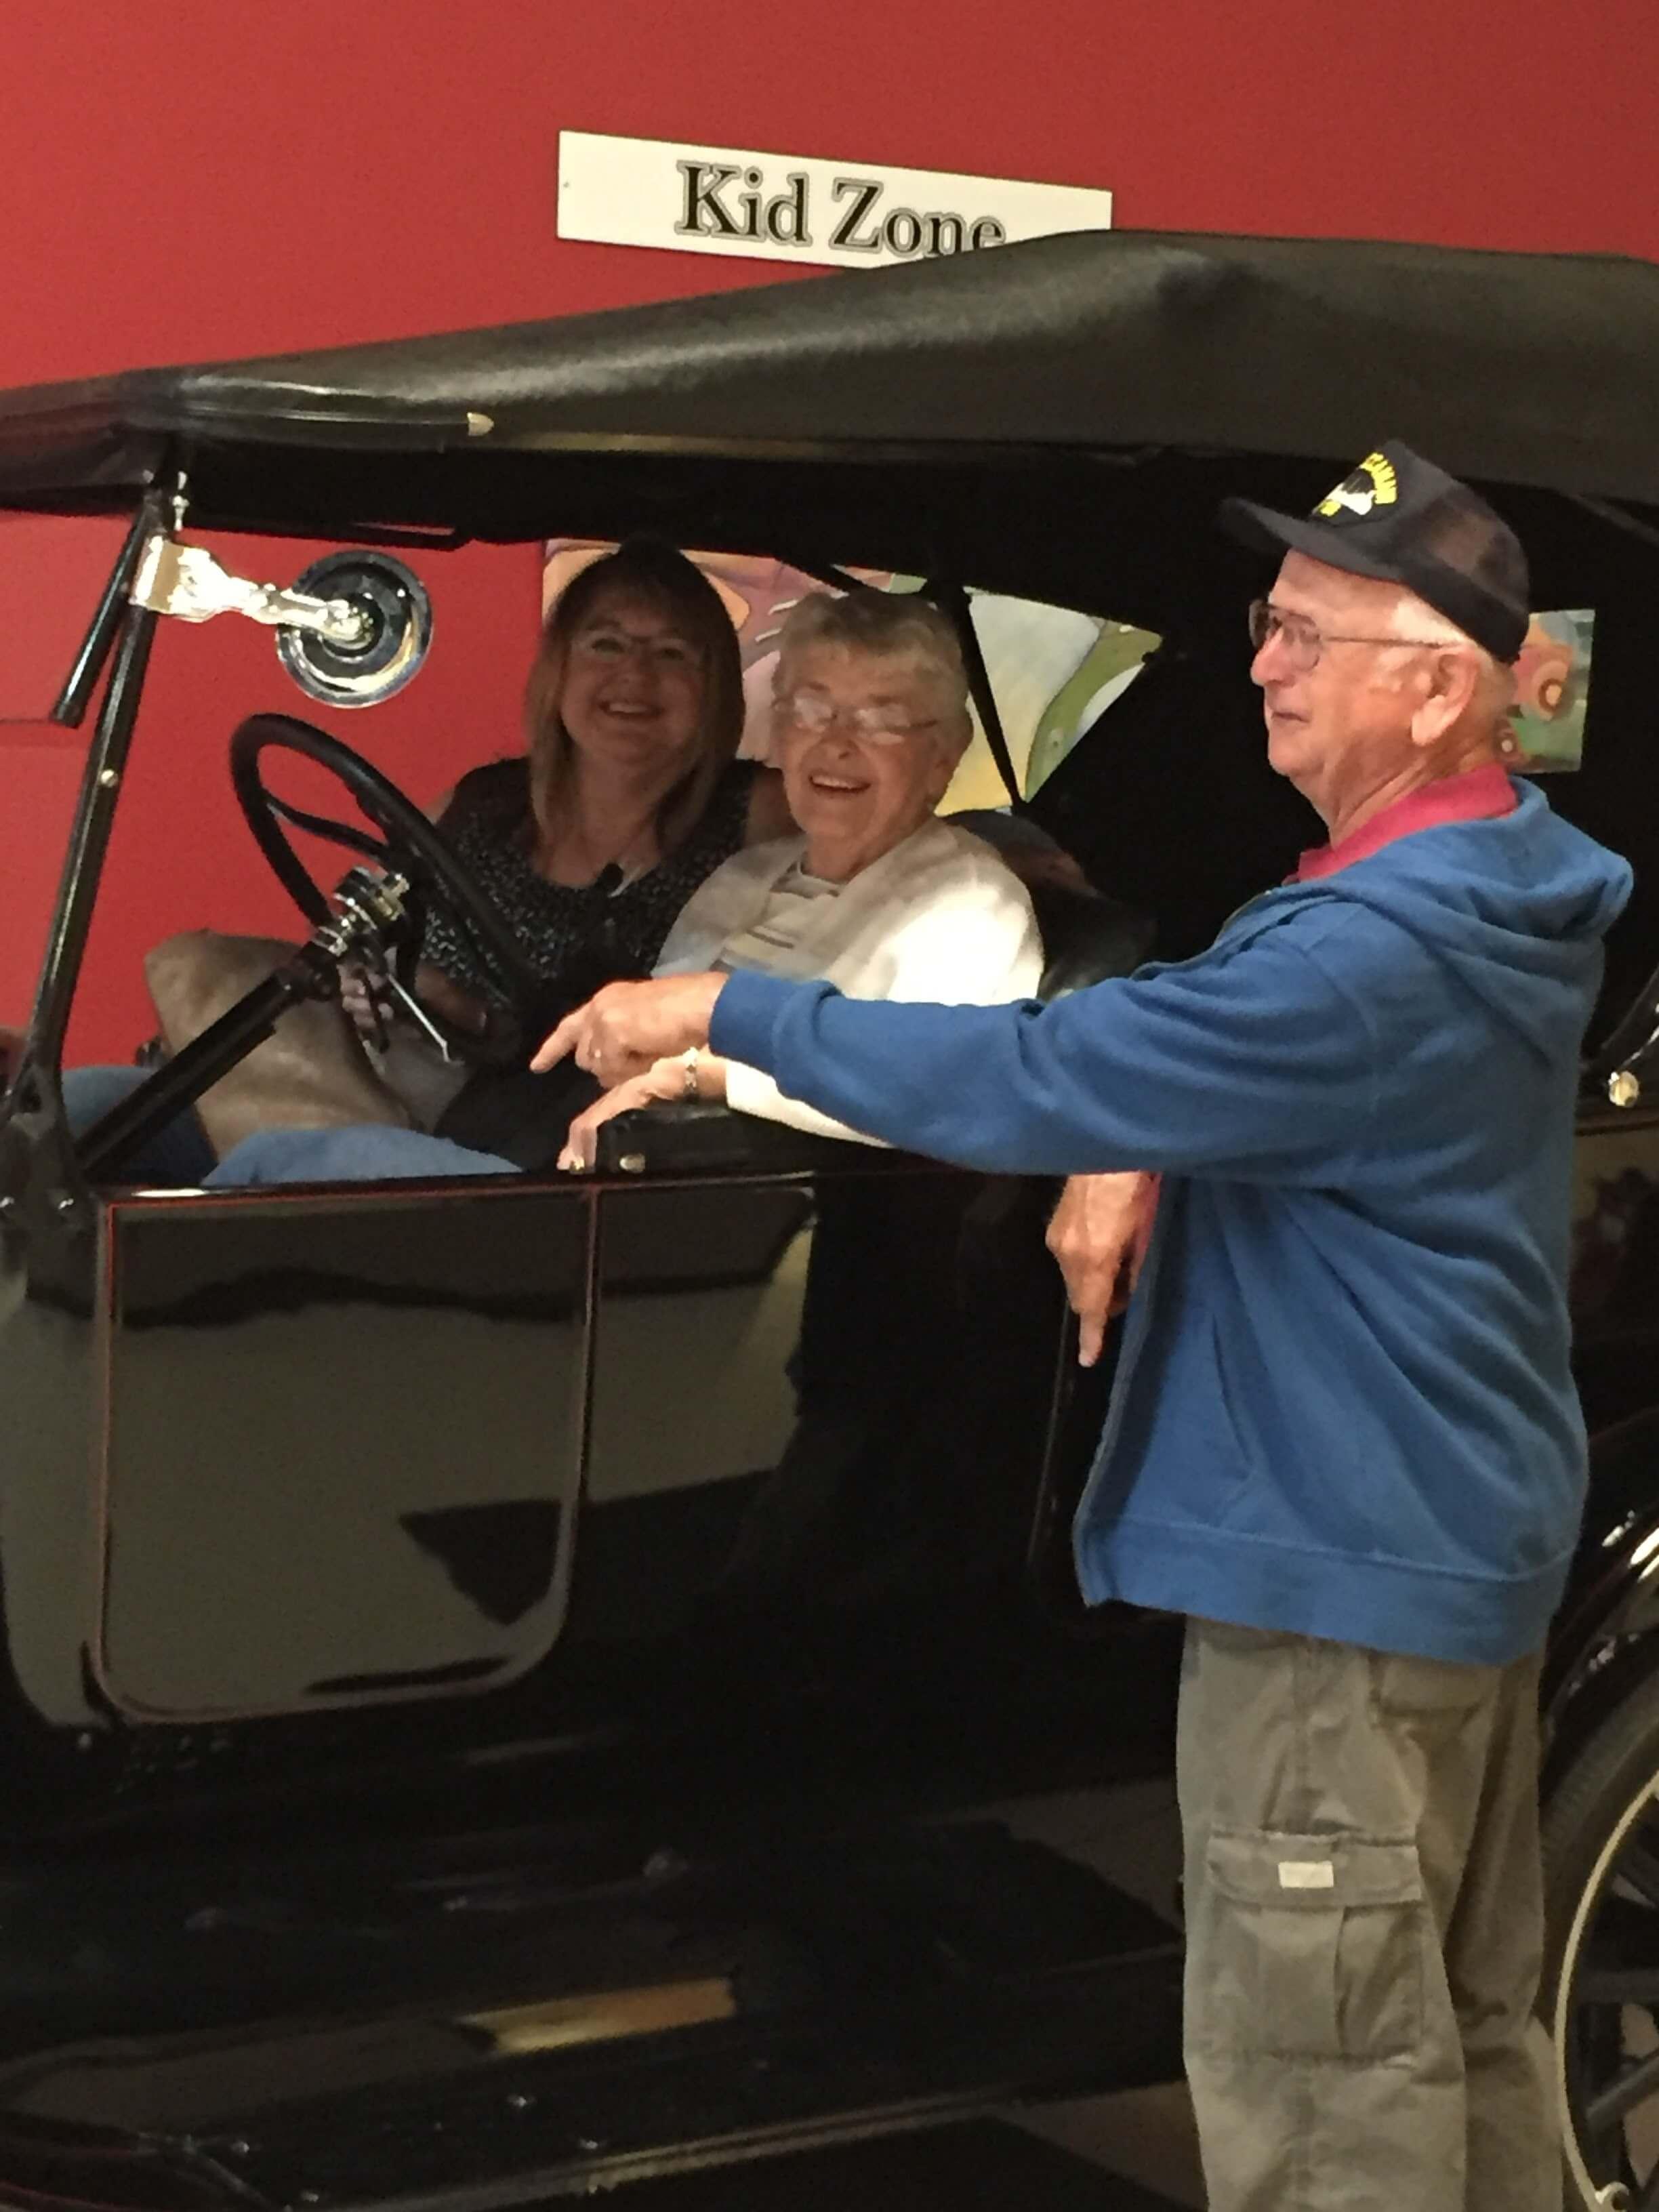 Sue, Mom, Dad, Car museum, Nebraska, 2017